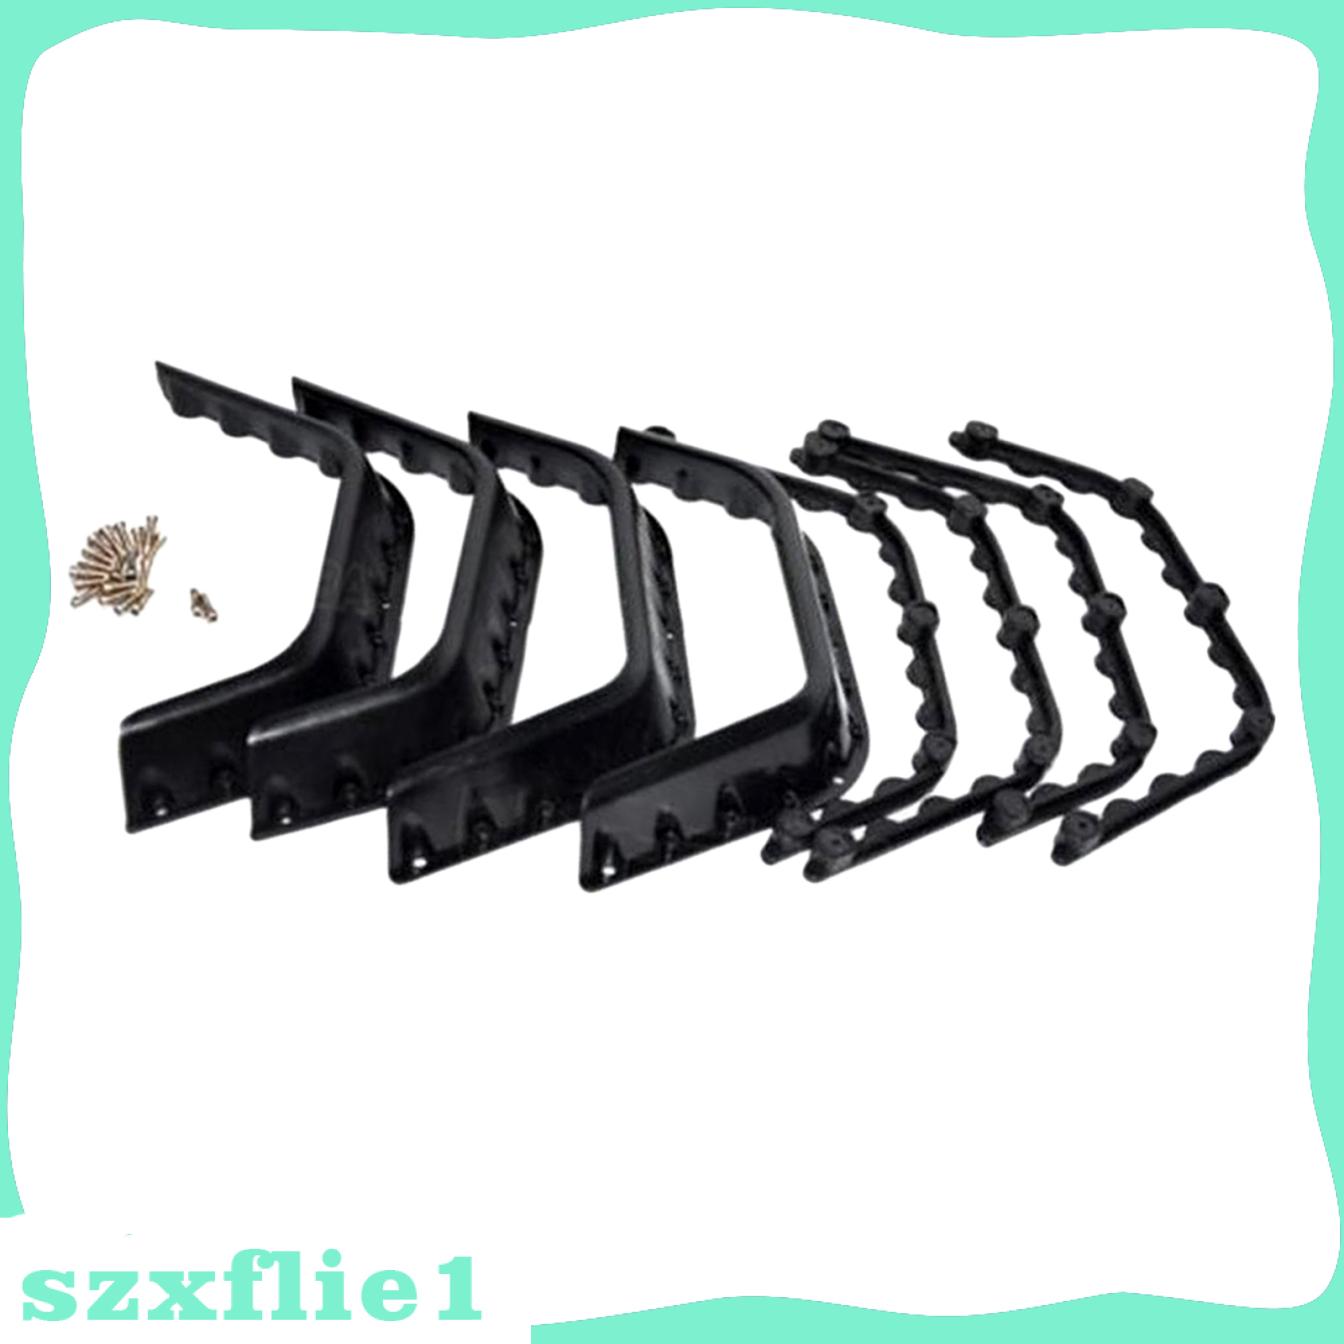 Suku Cadang Fender Flares Mobil Rc 1 / 10 Warna Hitam